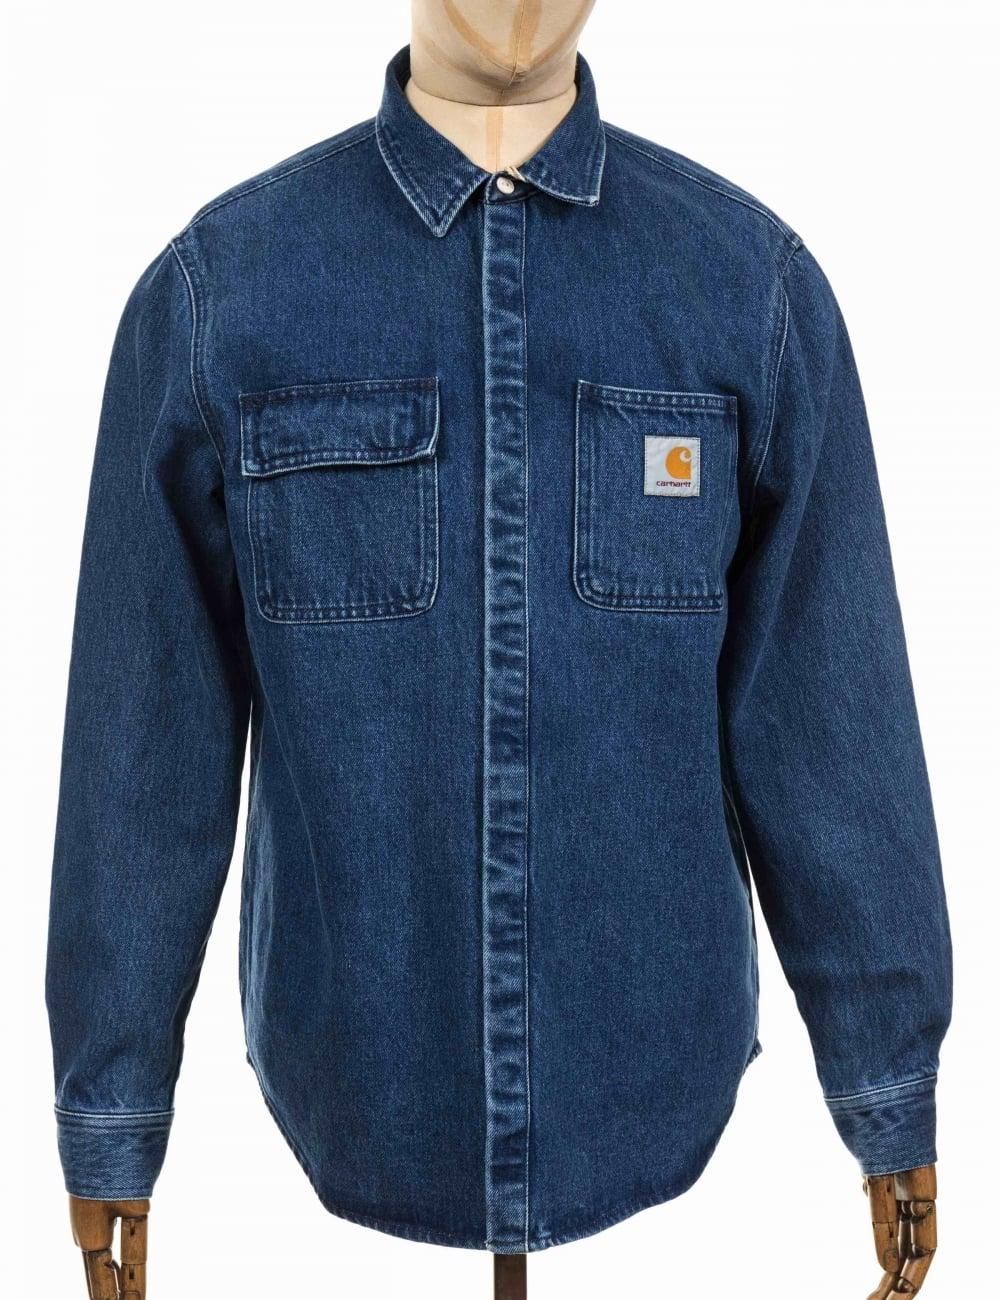 415ddd665f Carhartt WIP Salinac Shirt Jacket - Blue Stone Washed - Clothing ...